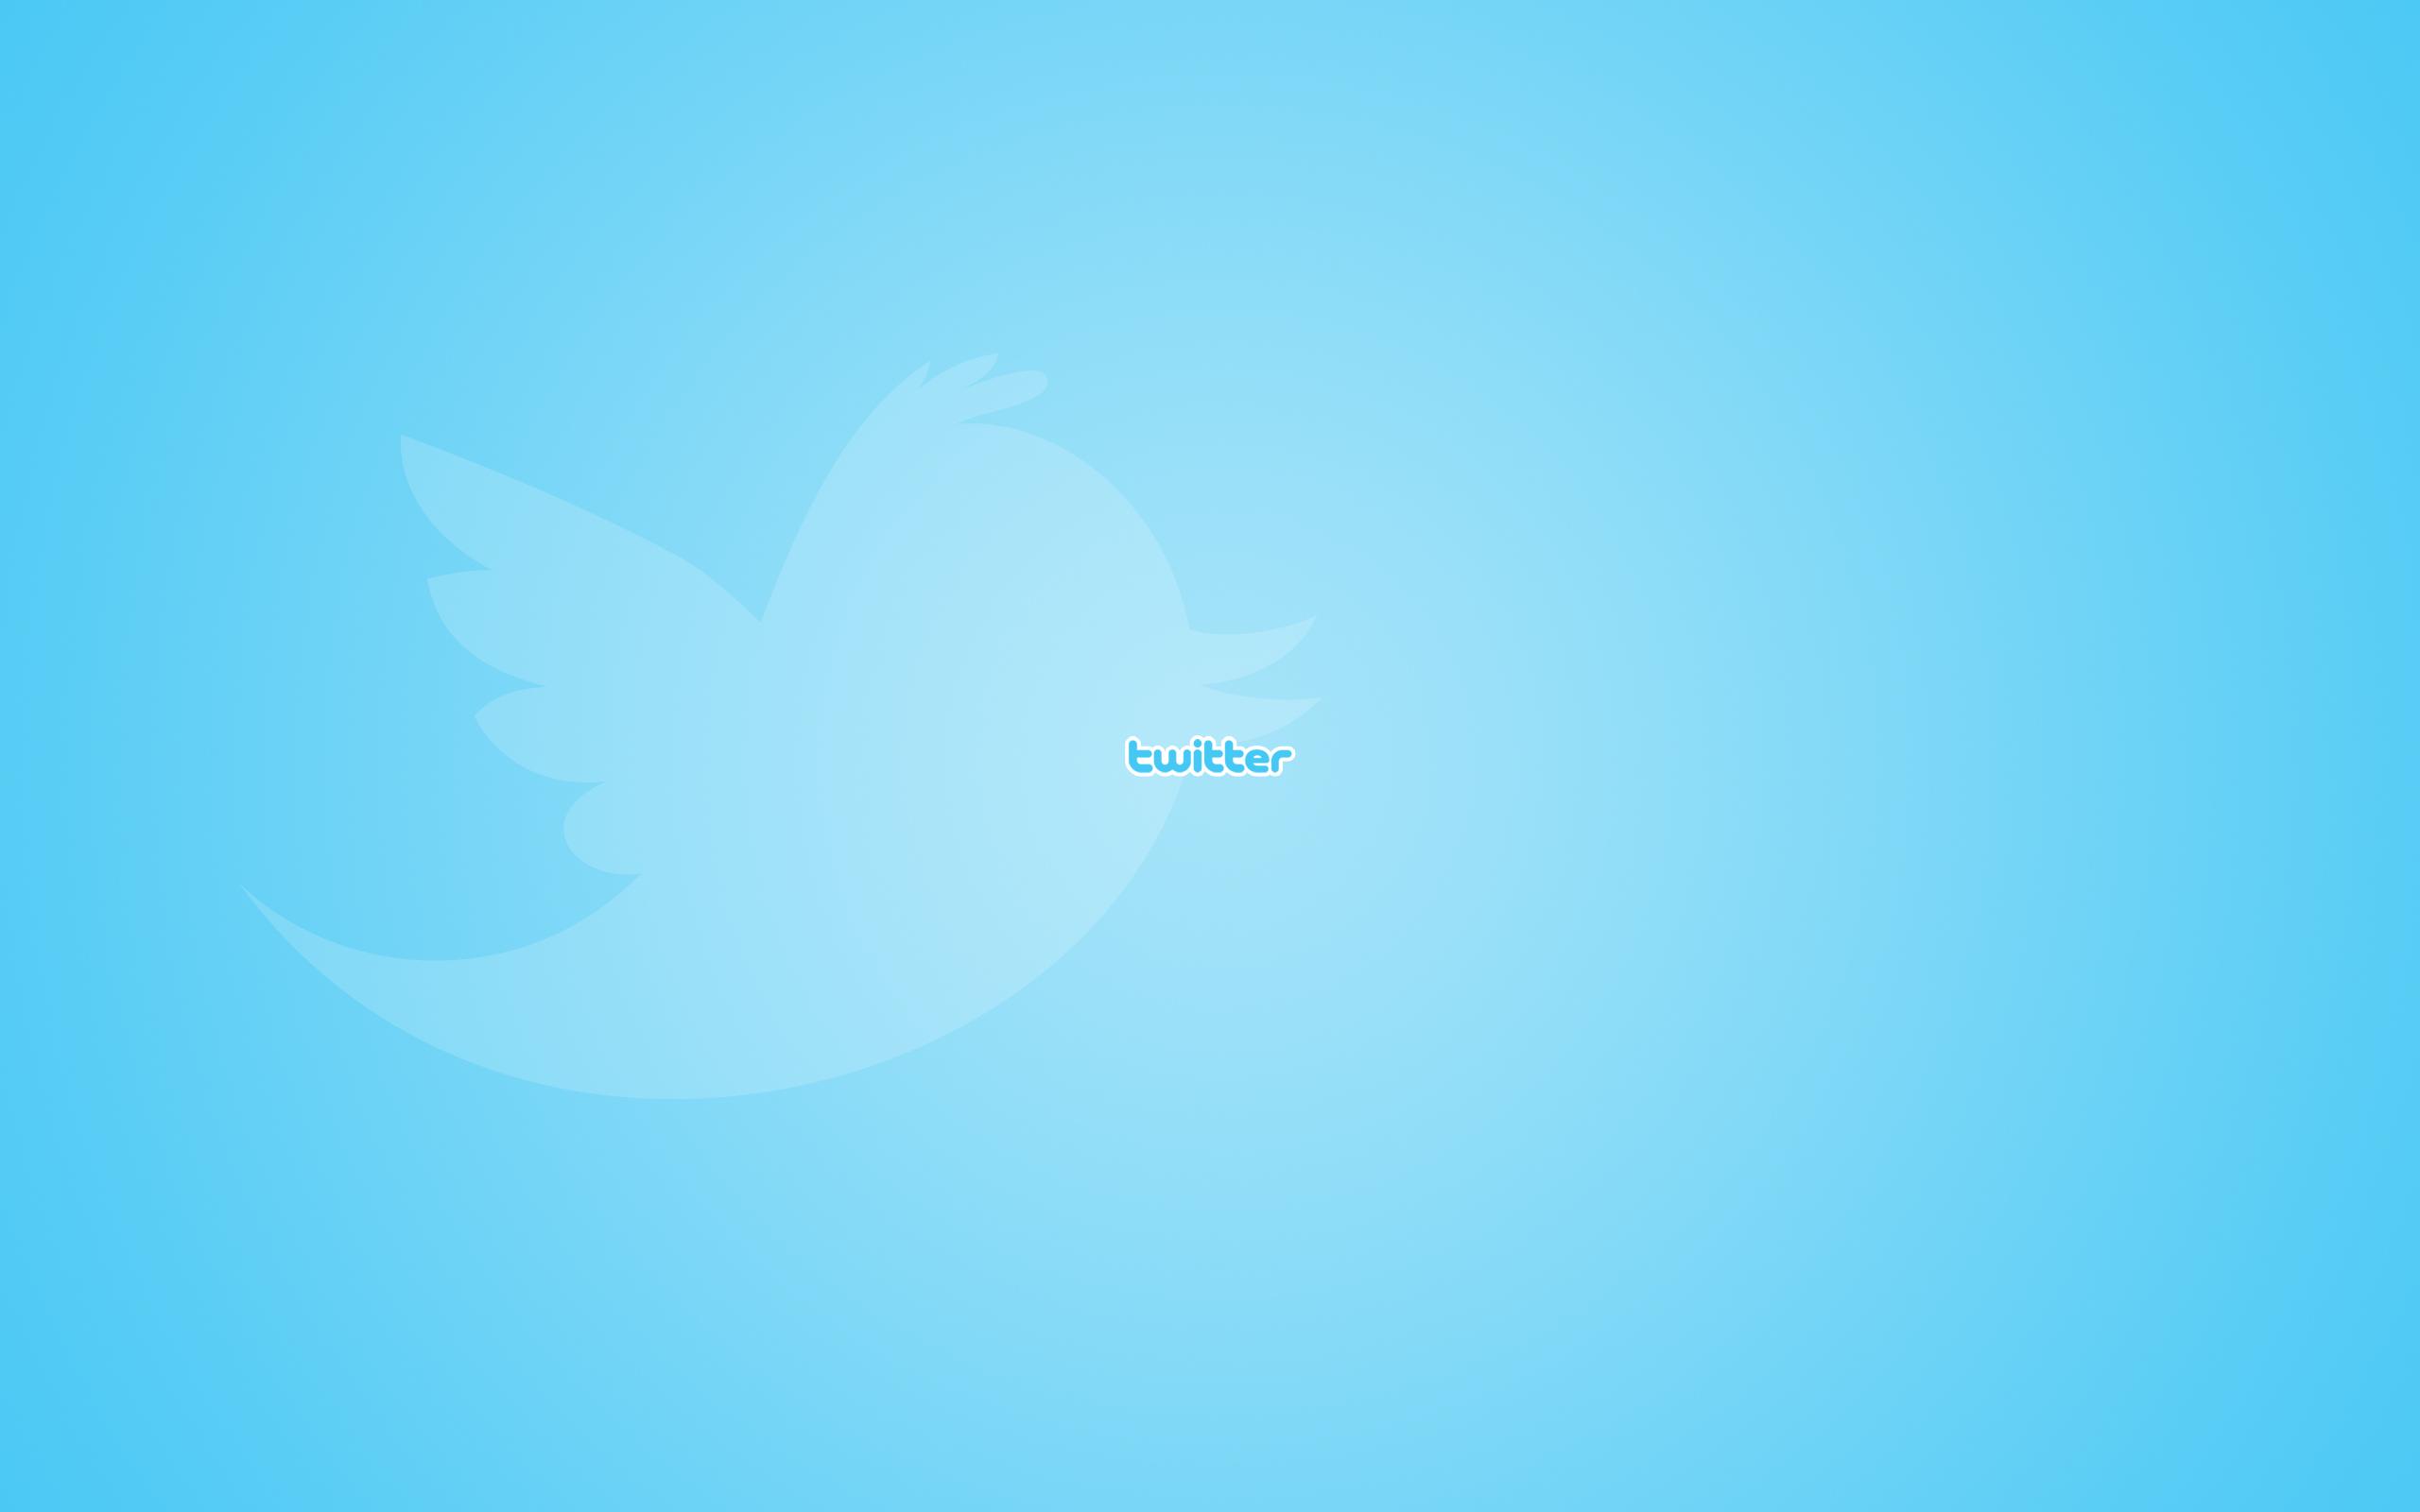 twitter logo background wallpaper 67336